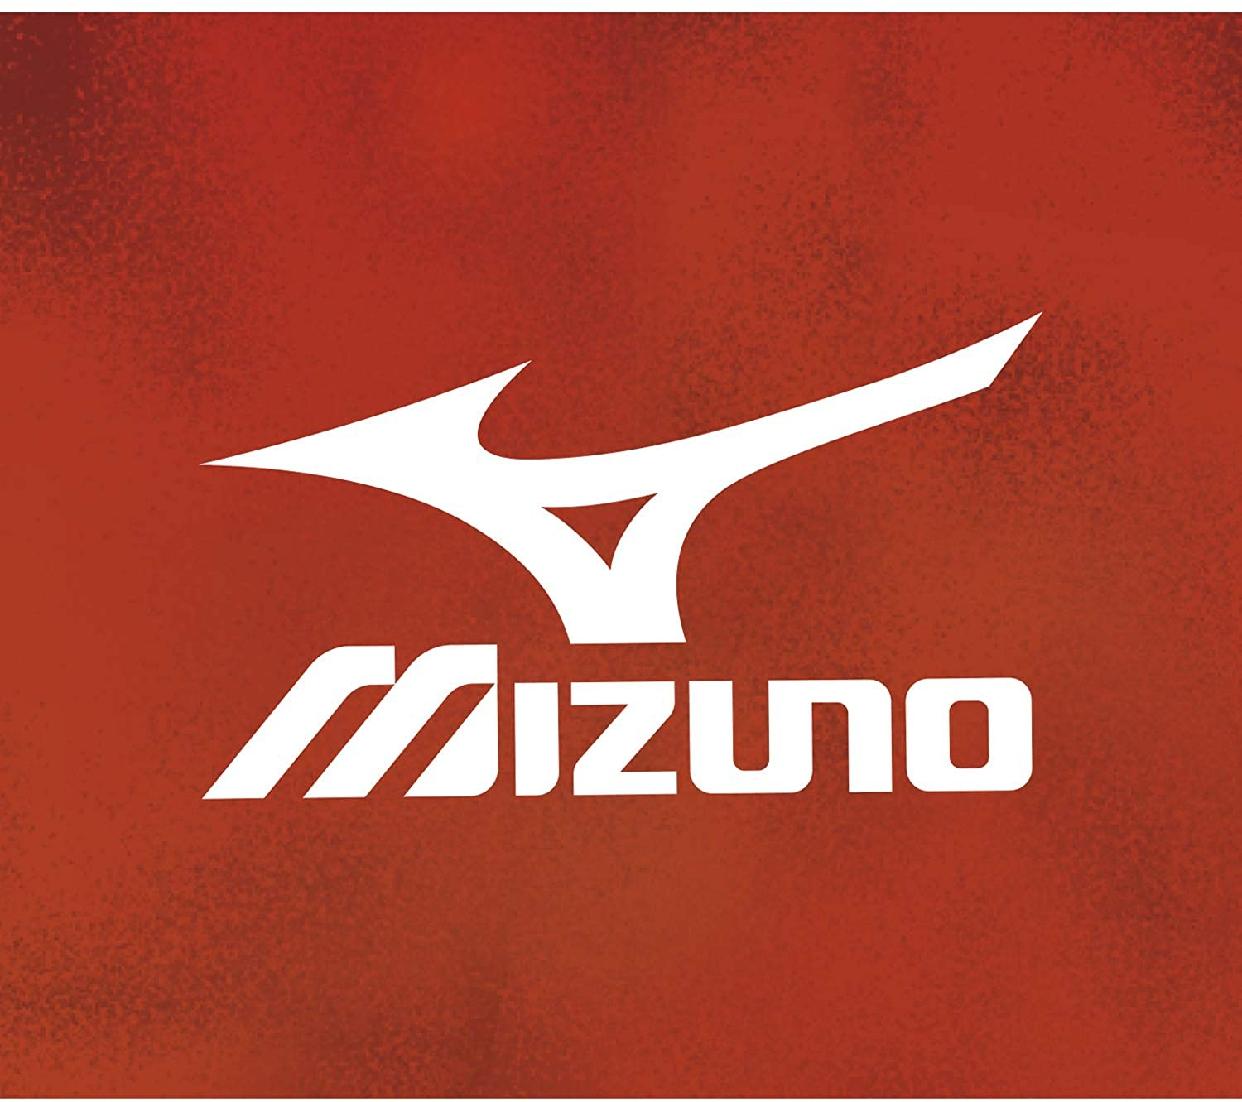 MIZUNO(ミズノ)ルームシューズの商品画像6